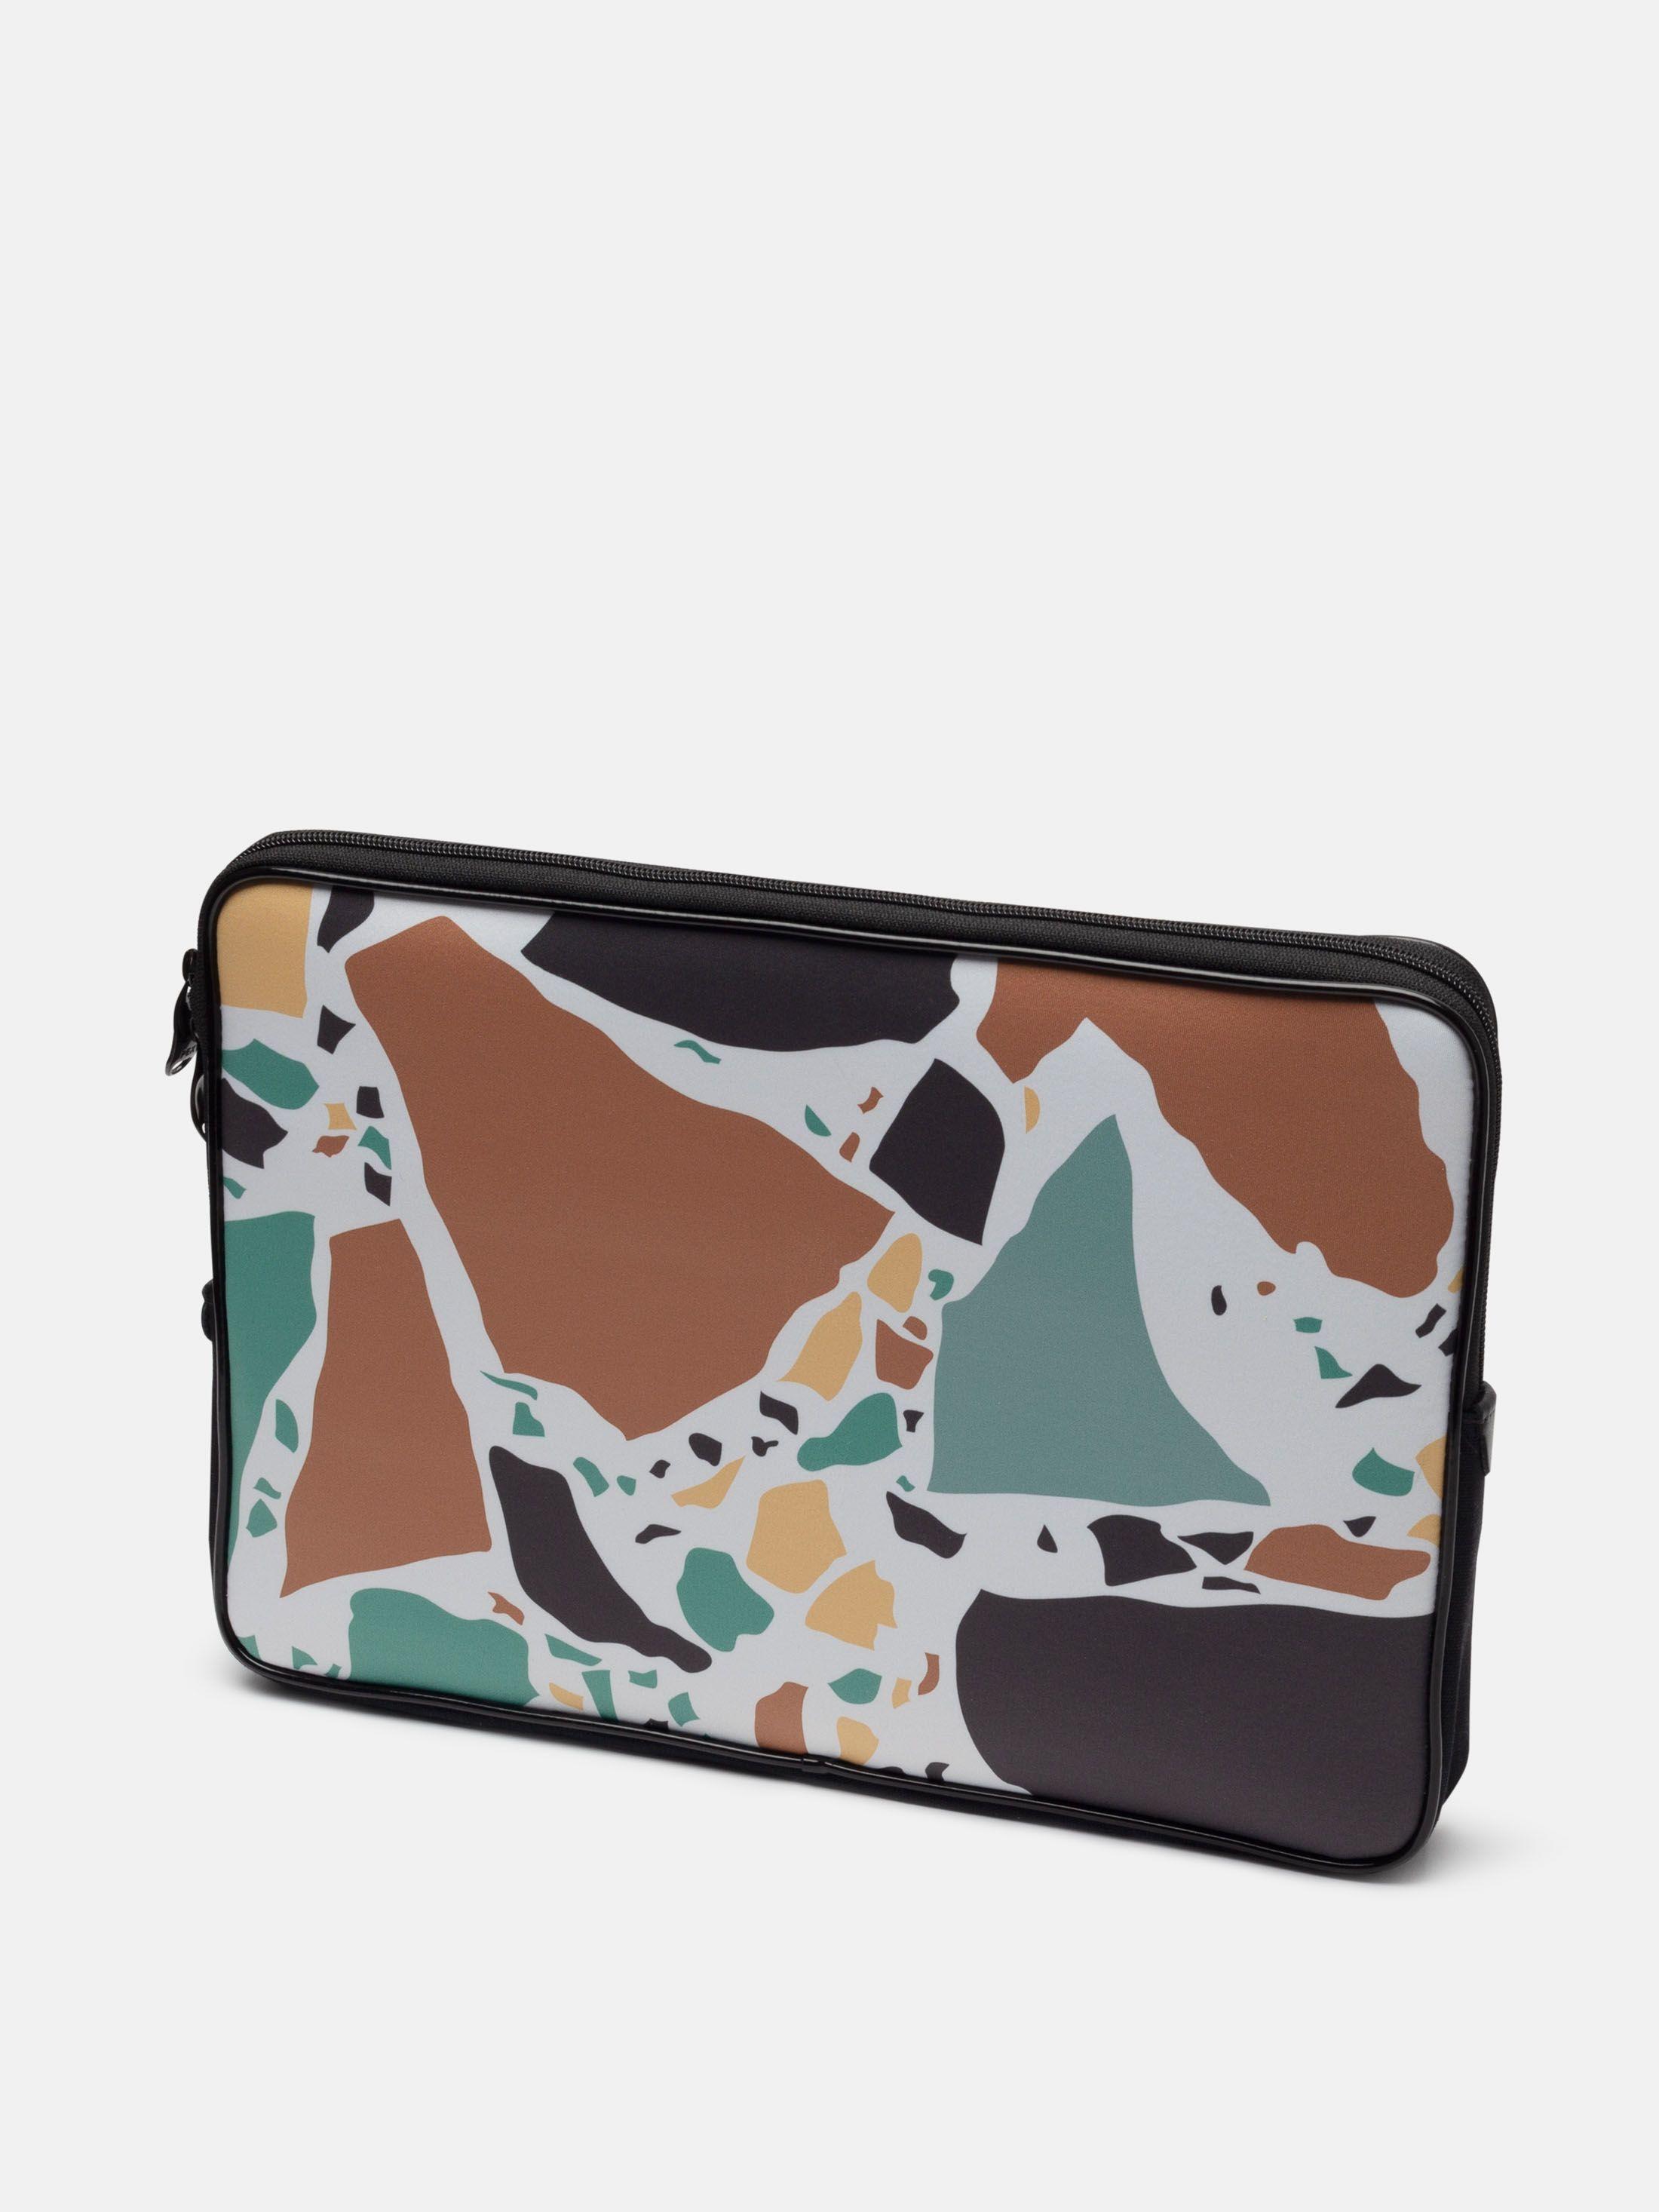 Design personalised laptop bags